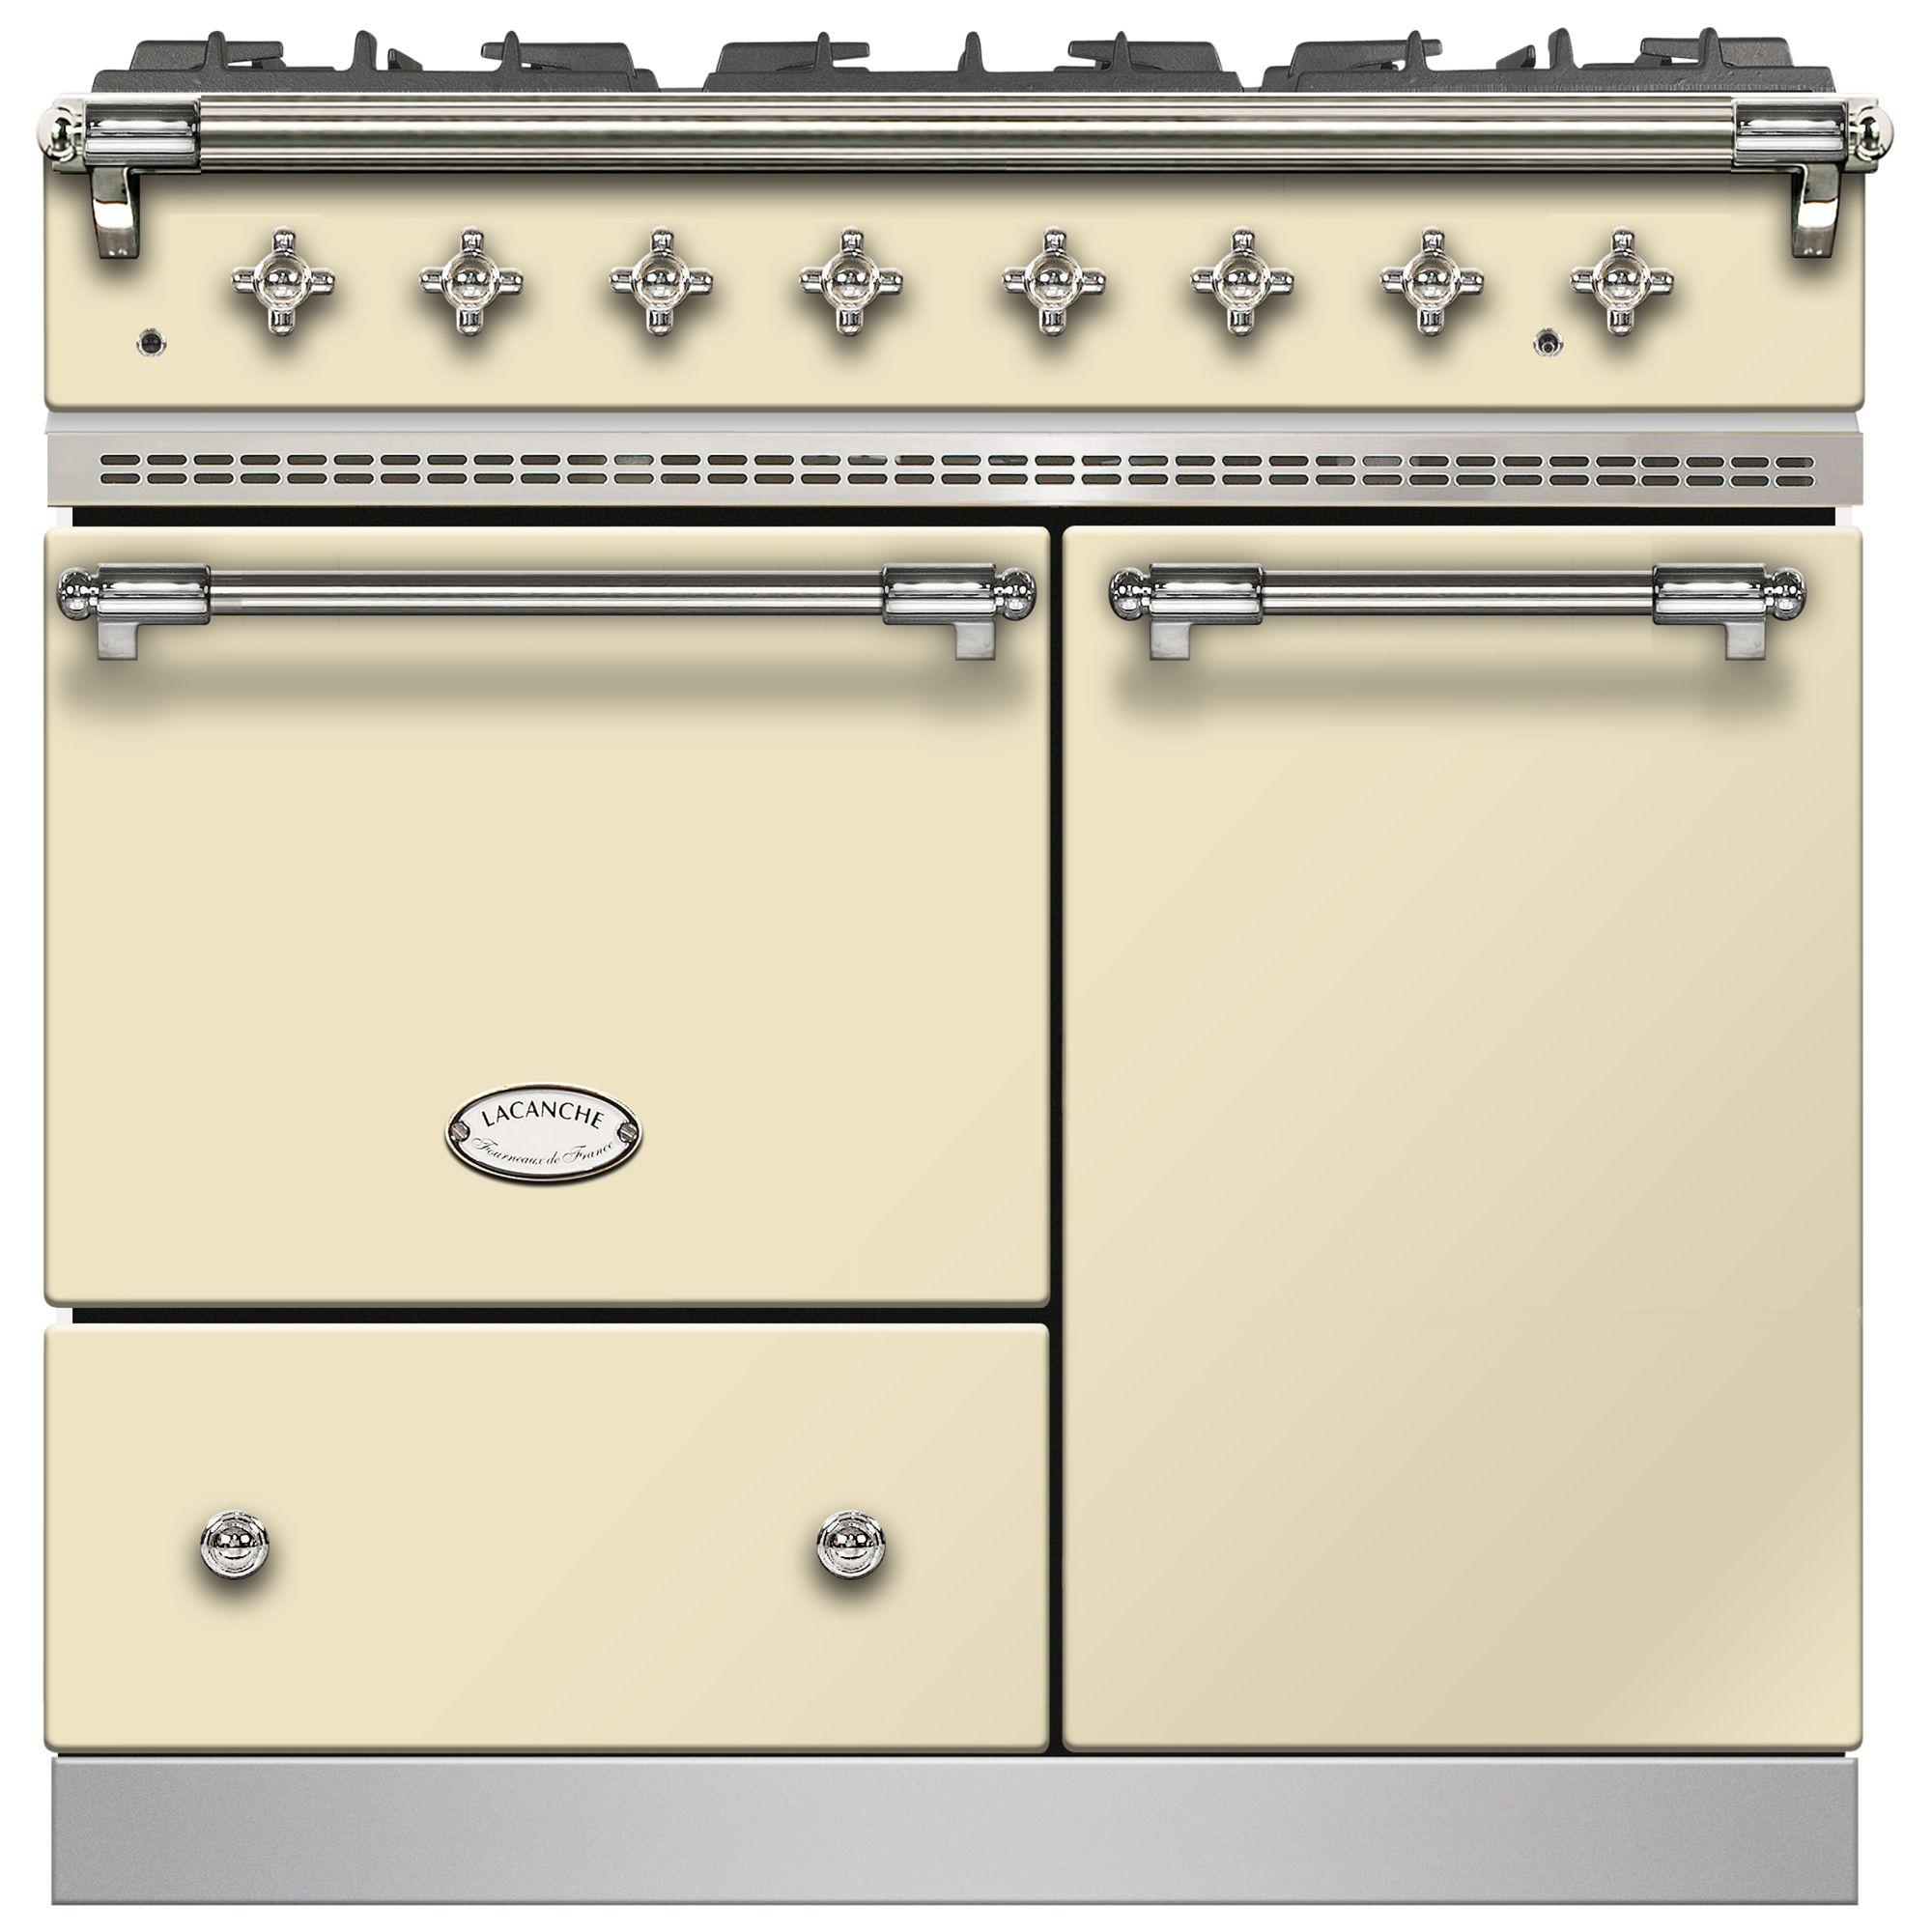 Lacanche Lacanche Beaune LG962GCTDCRCHA Dual Fuel Range Cooker, English Cream / Chrome Trim